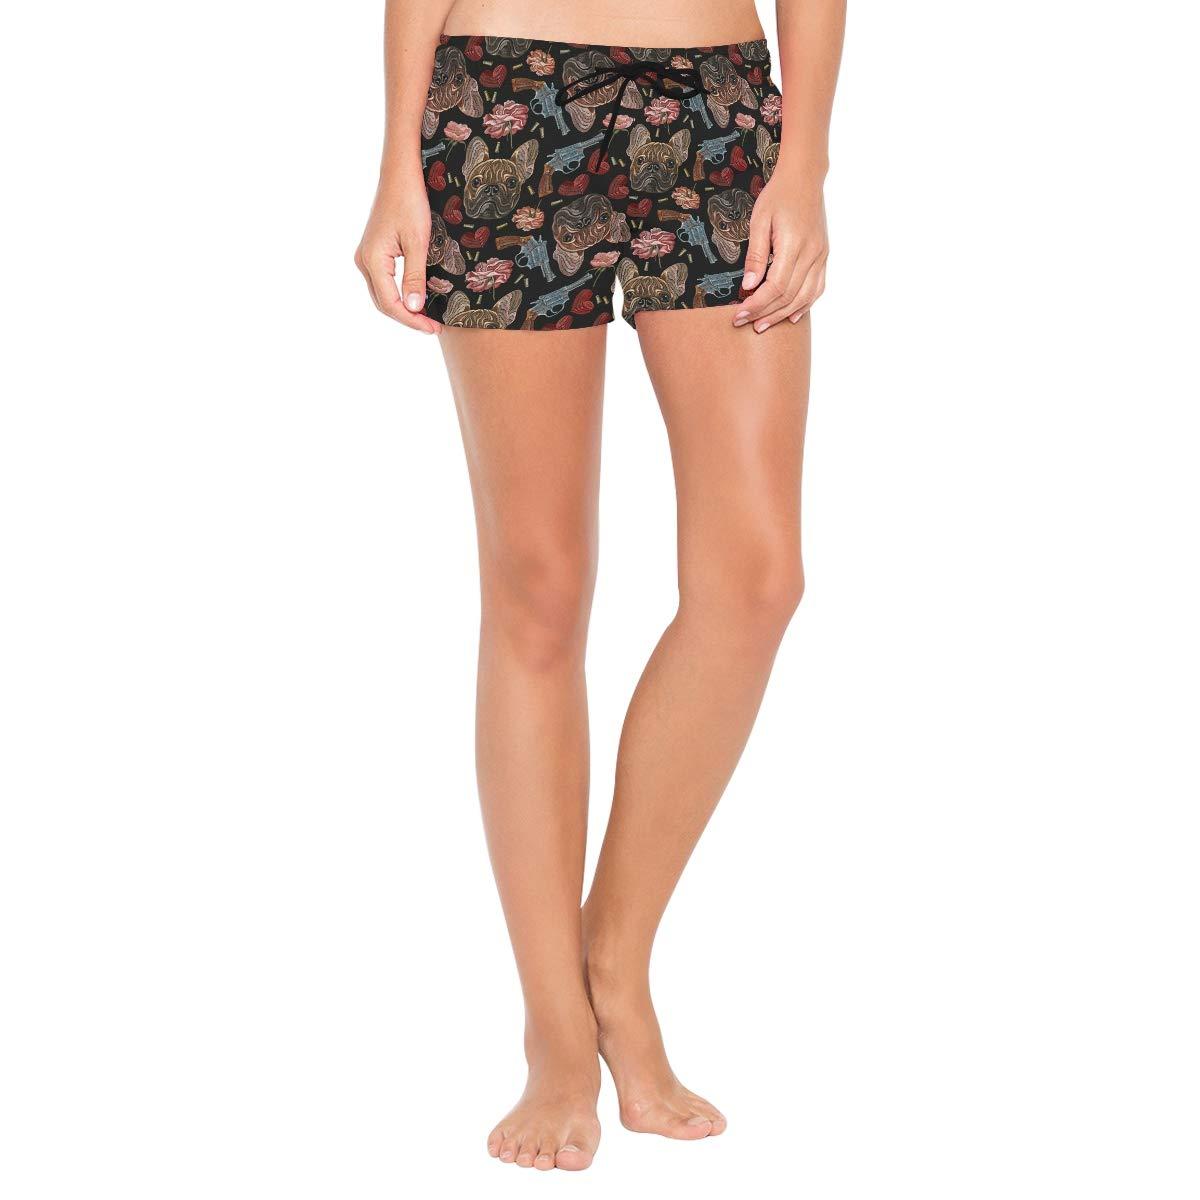 Lttedeng Womens Bulldog Flowers Hearts Guns Shorts Swimwear Running Shorts Beach Shorts for Women